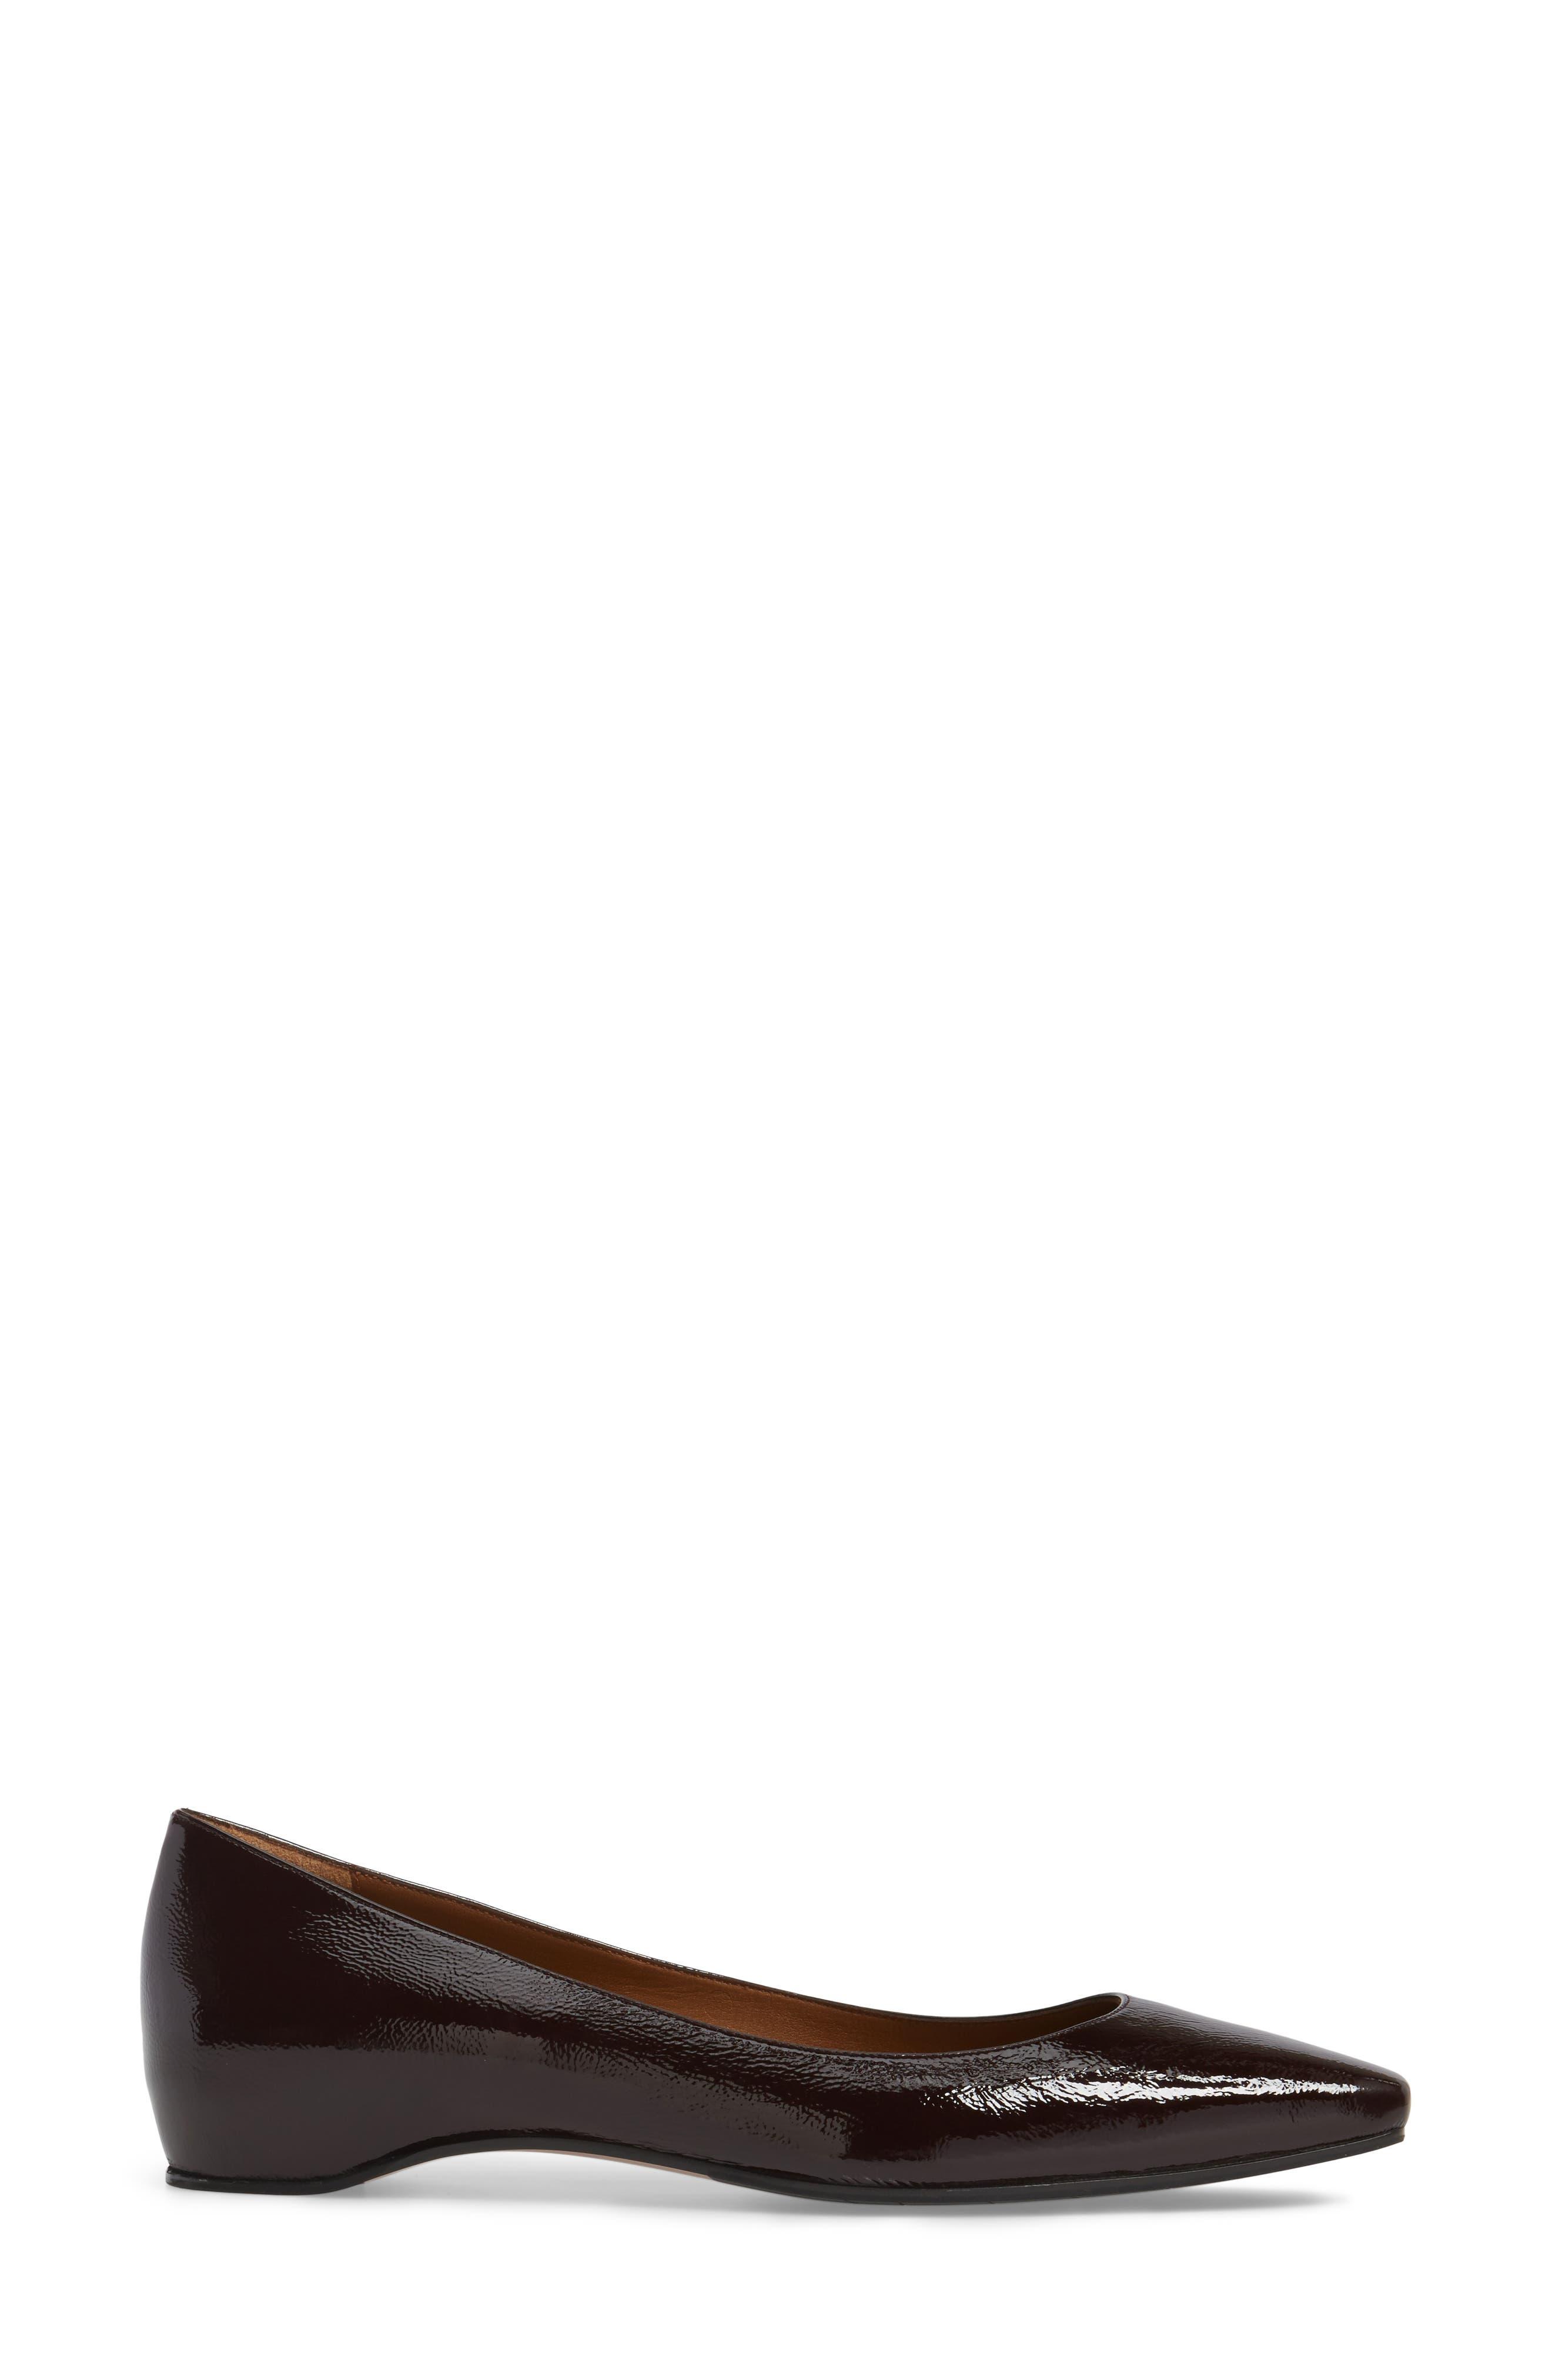 Marcella Weatherproof Leather Flat,                             Alternate thumbnail 3, color,                             Wine